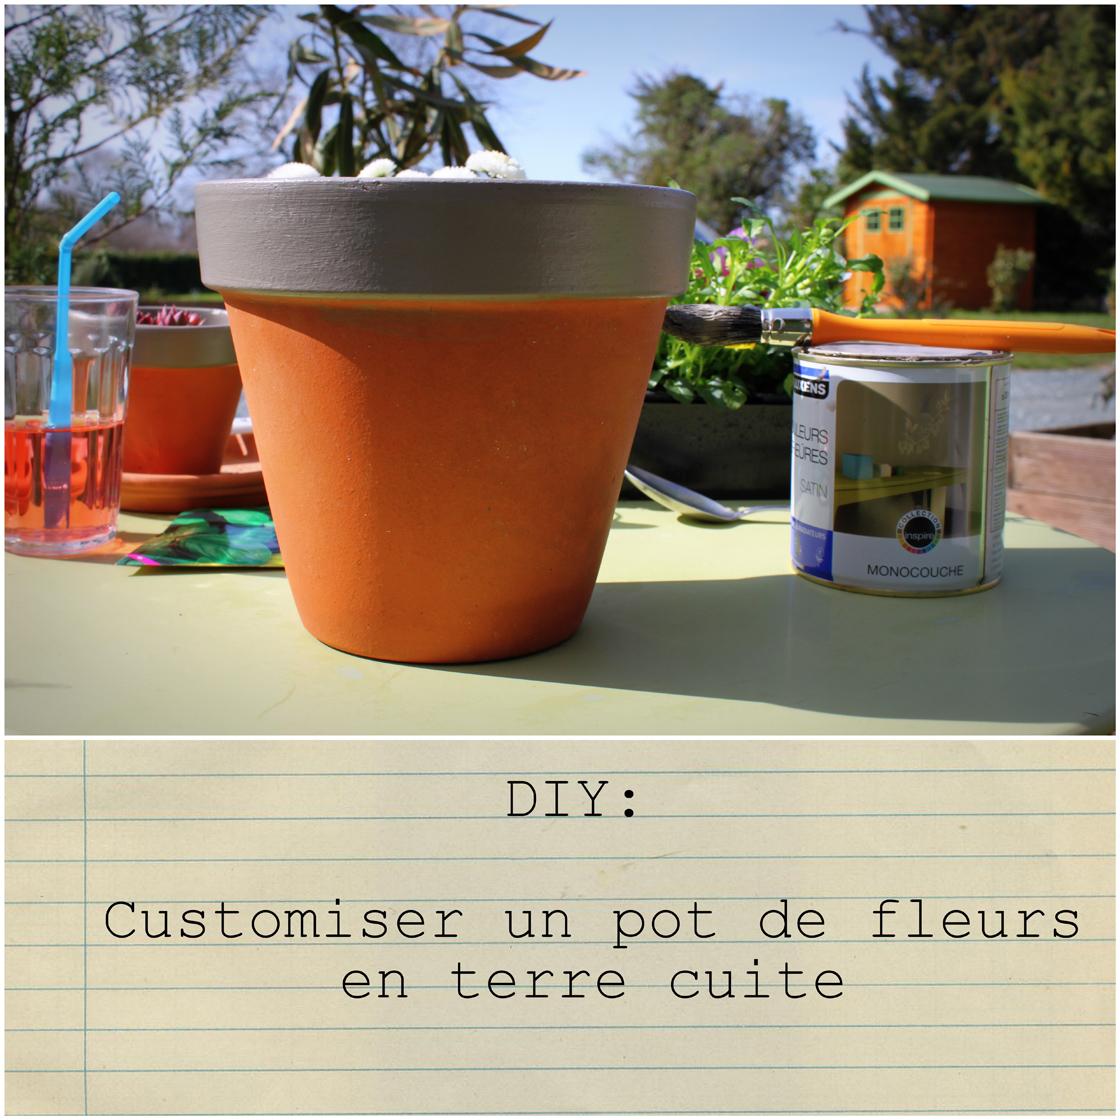 mandy bla bla diy du dimanche customiser un pot de fleurs. Black Bedroom Furniture Sets. Home Design Ideas